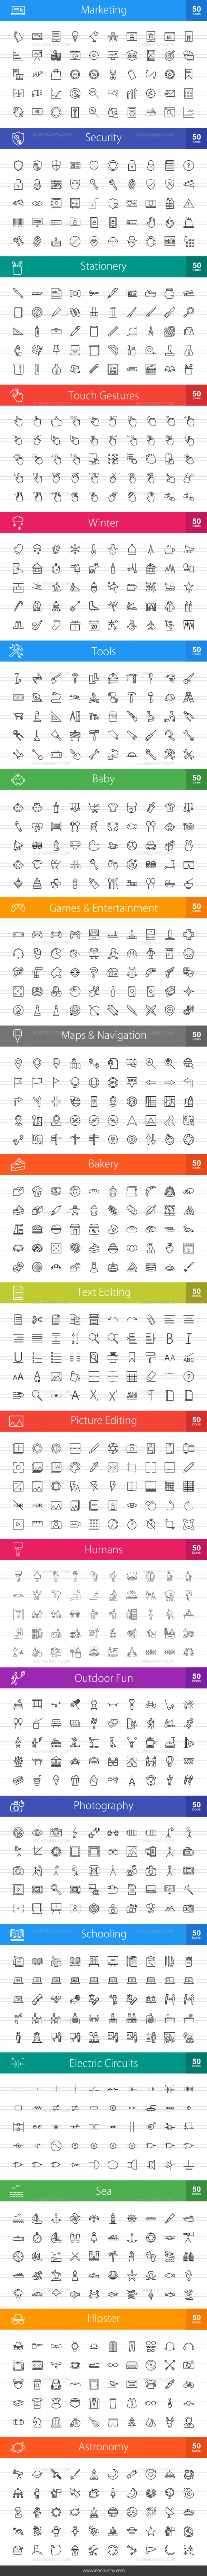 1000 Line Icons Bundle - Preview - IconBunny